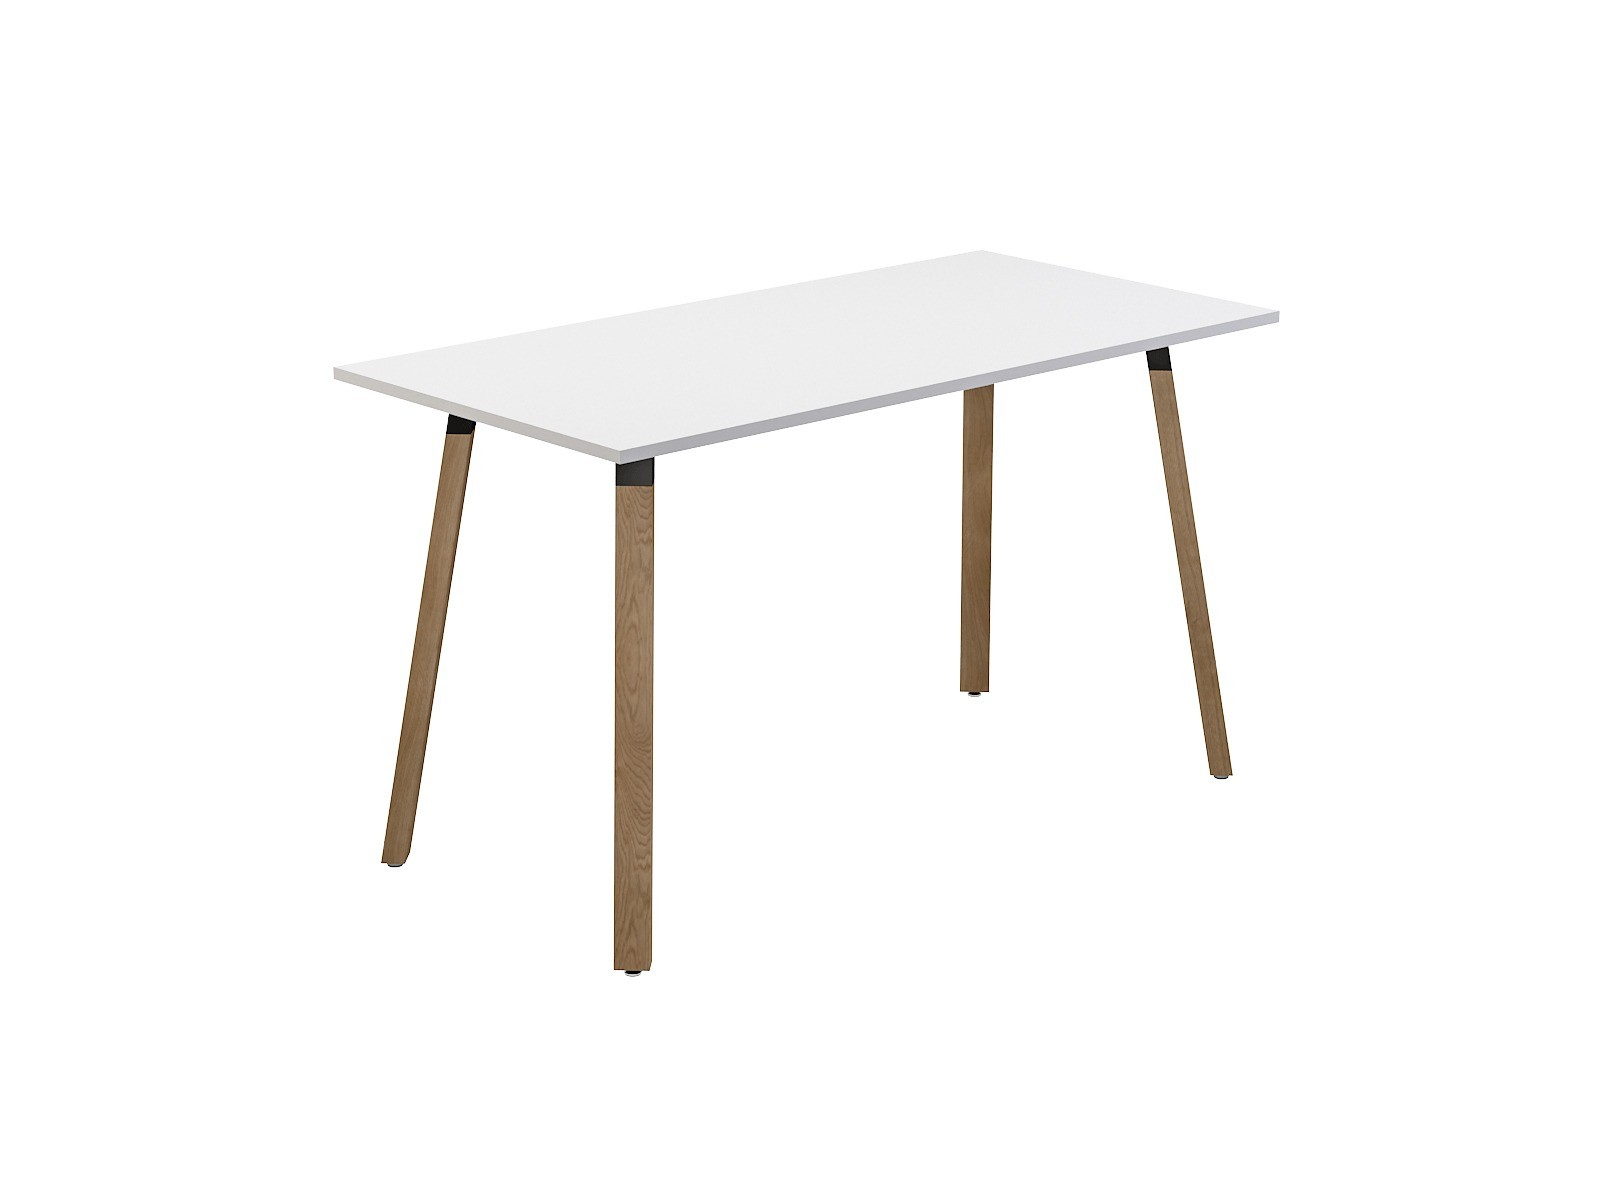 OL Plantation Bar Leaners Table